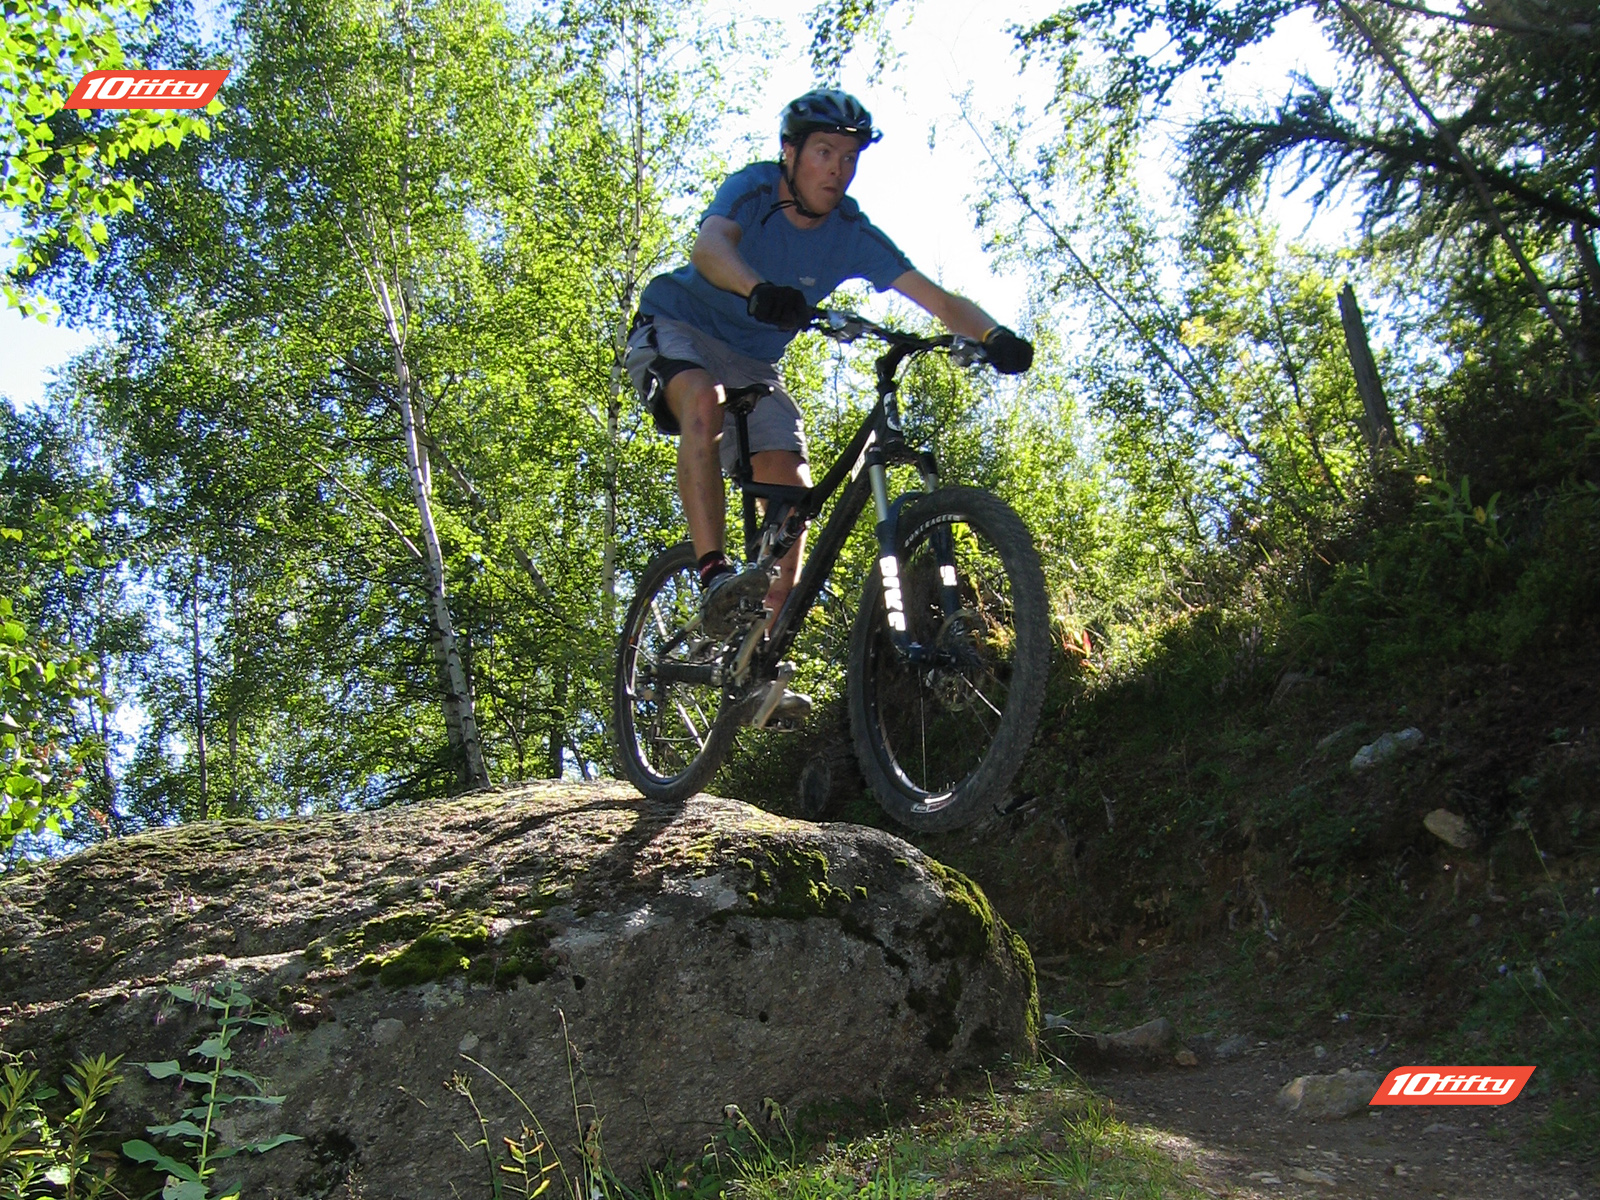 pics photos download high quality mountain bike bikes